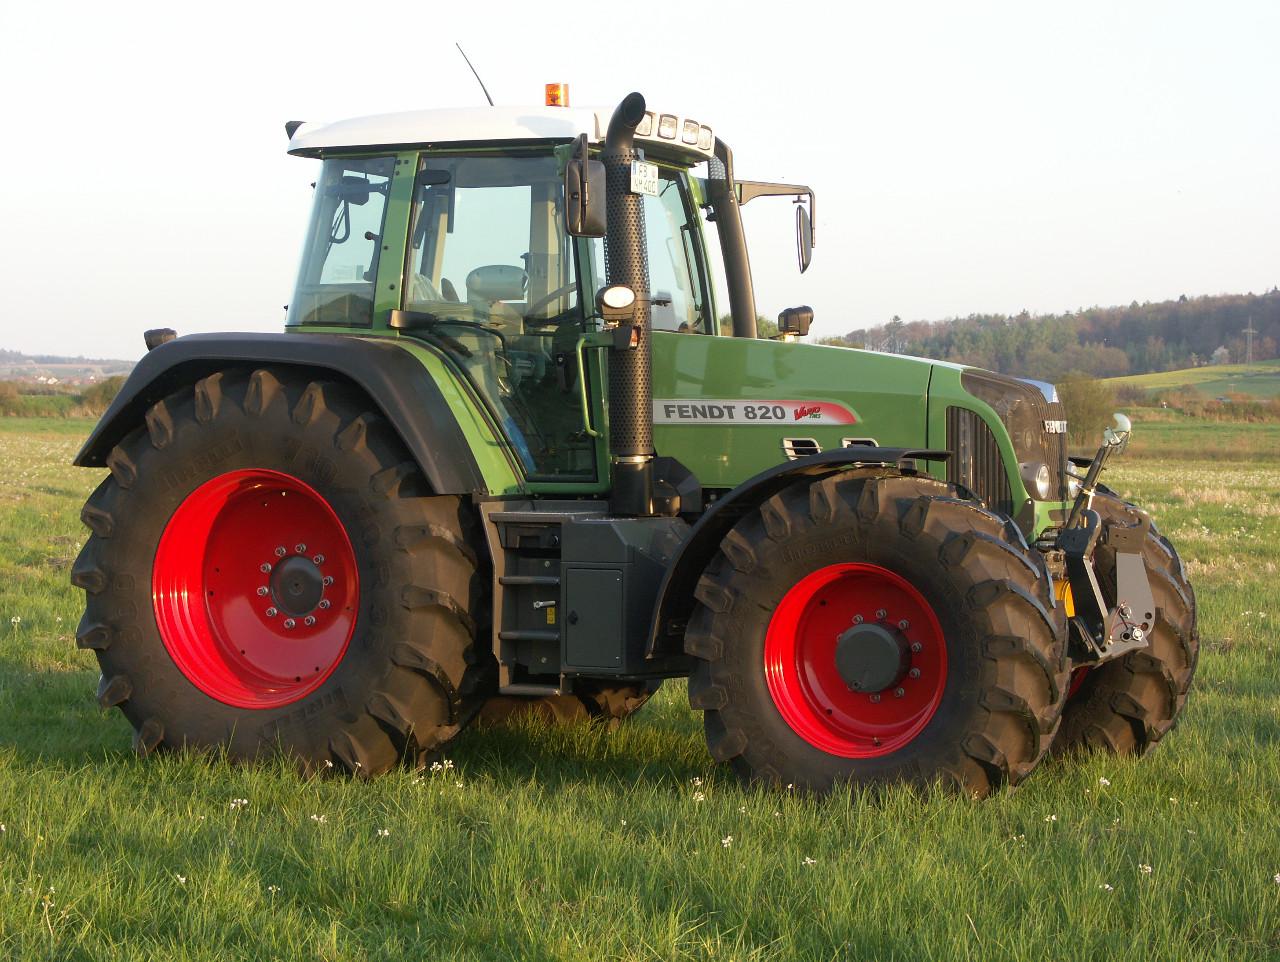 Ausmalbilder Traktor Fendt : Ausmalbilder Fendt Malvorlage Gratis